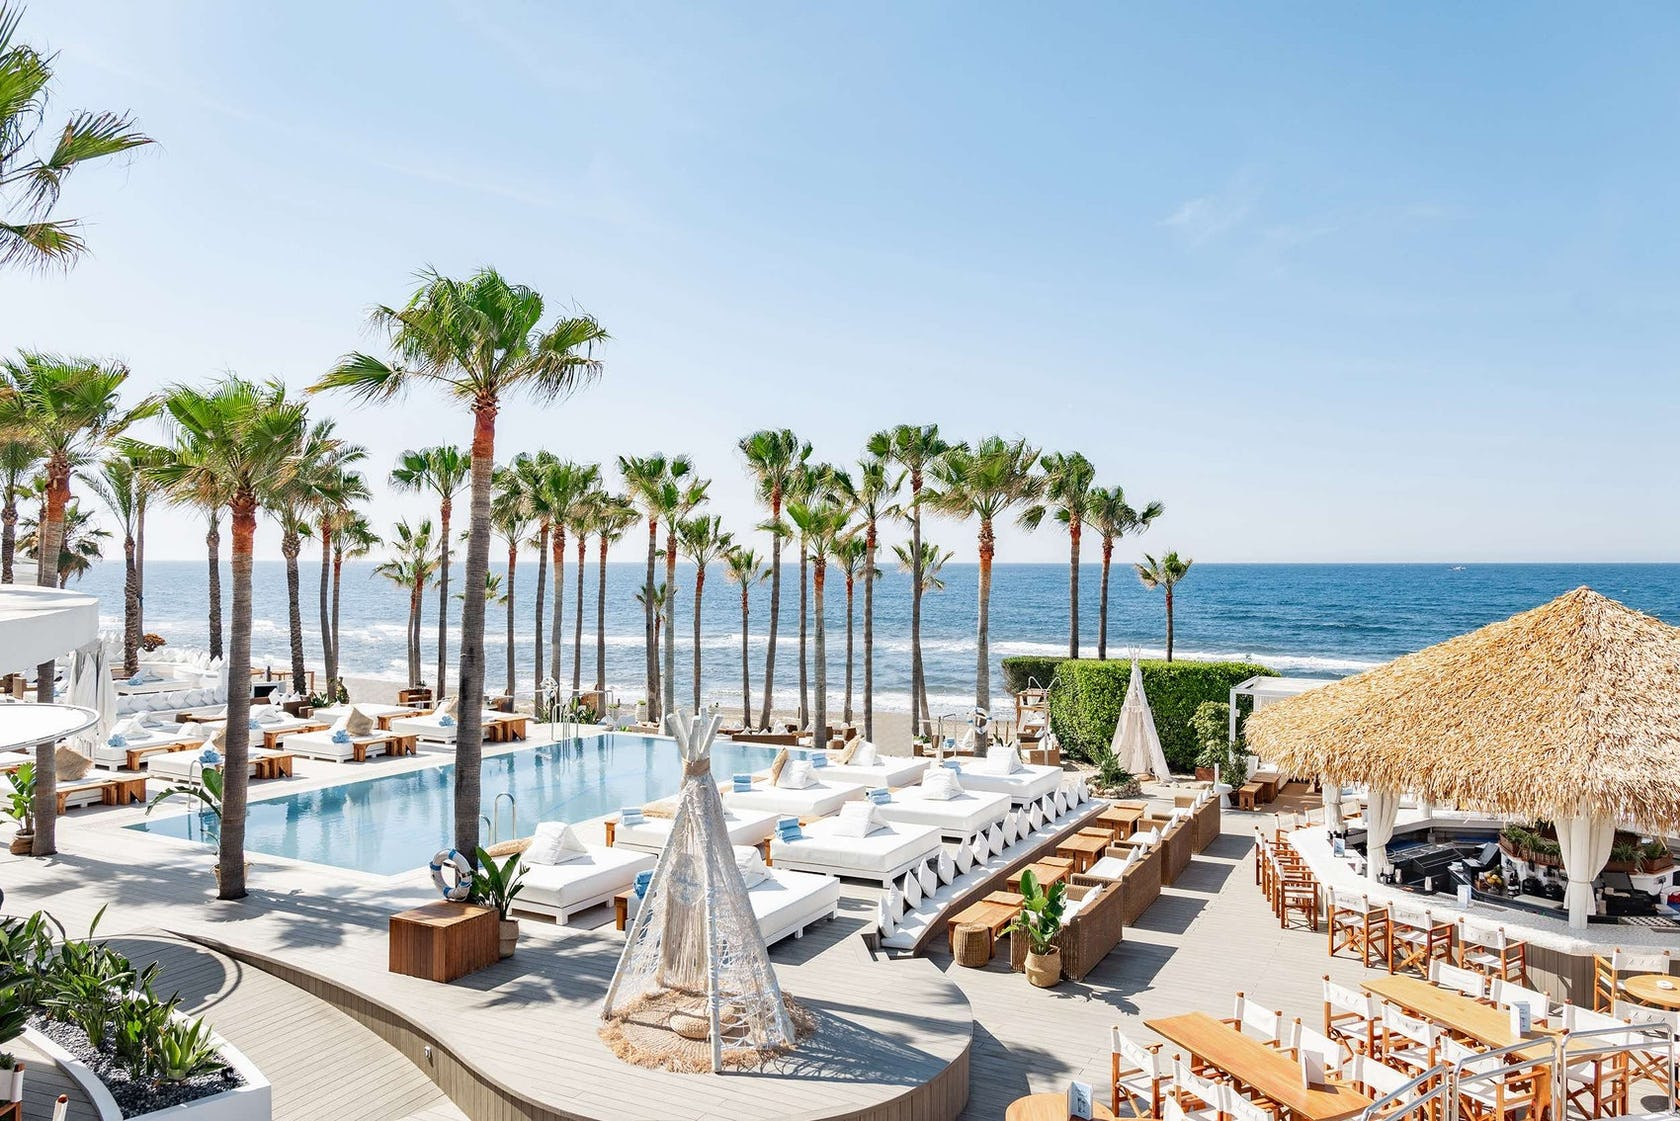 Top 5 Beach Clubs in Marbella